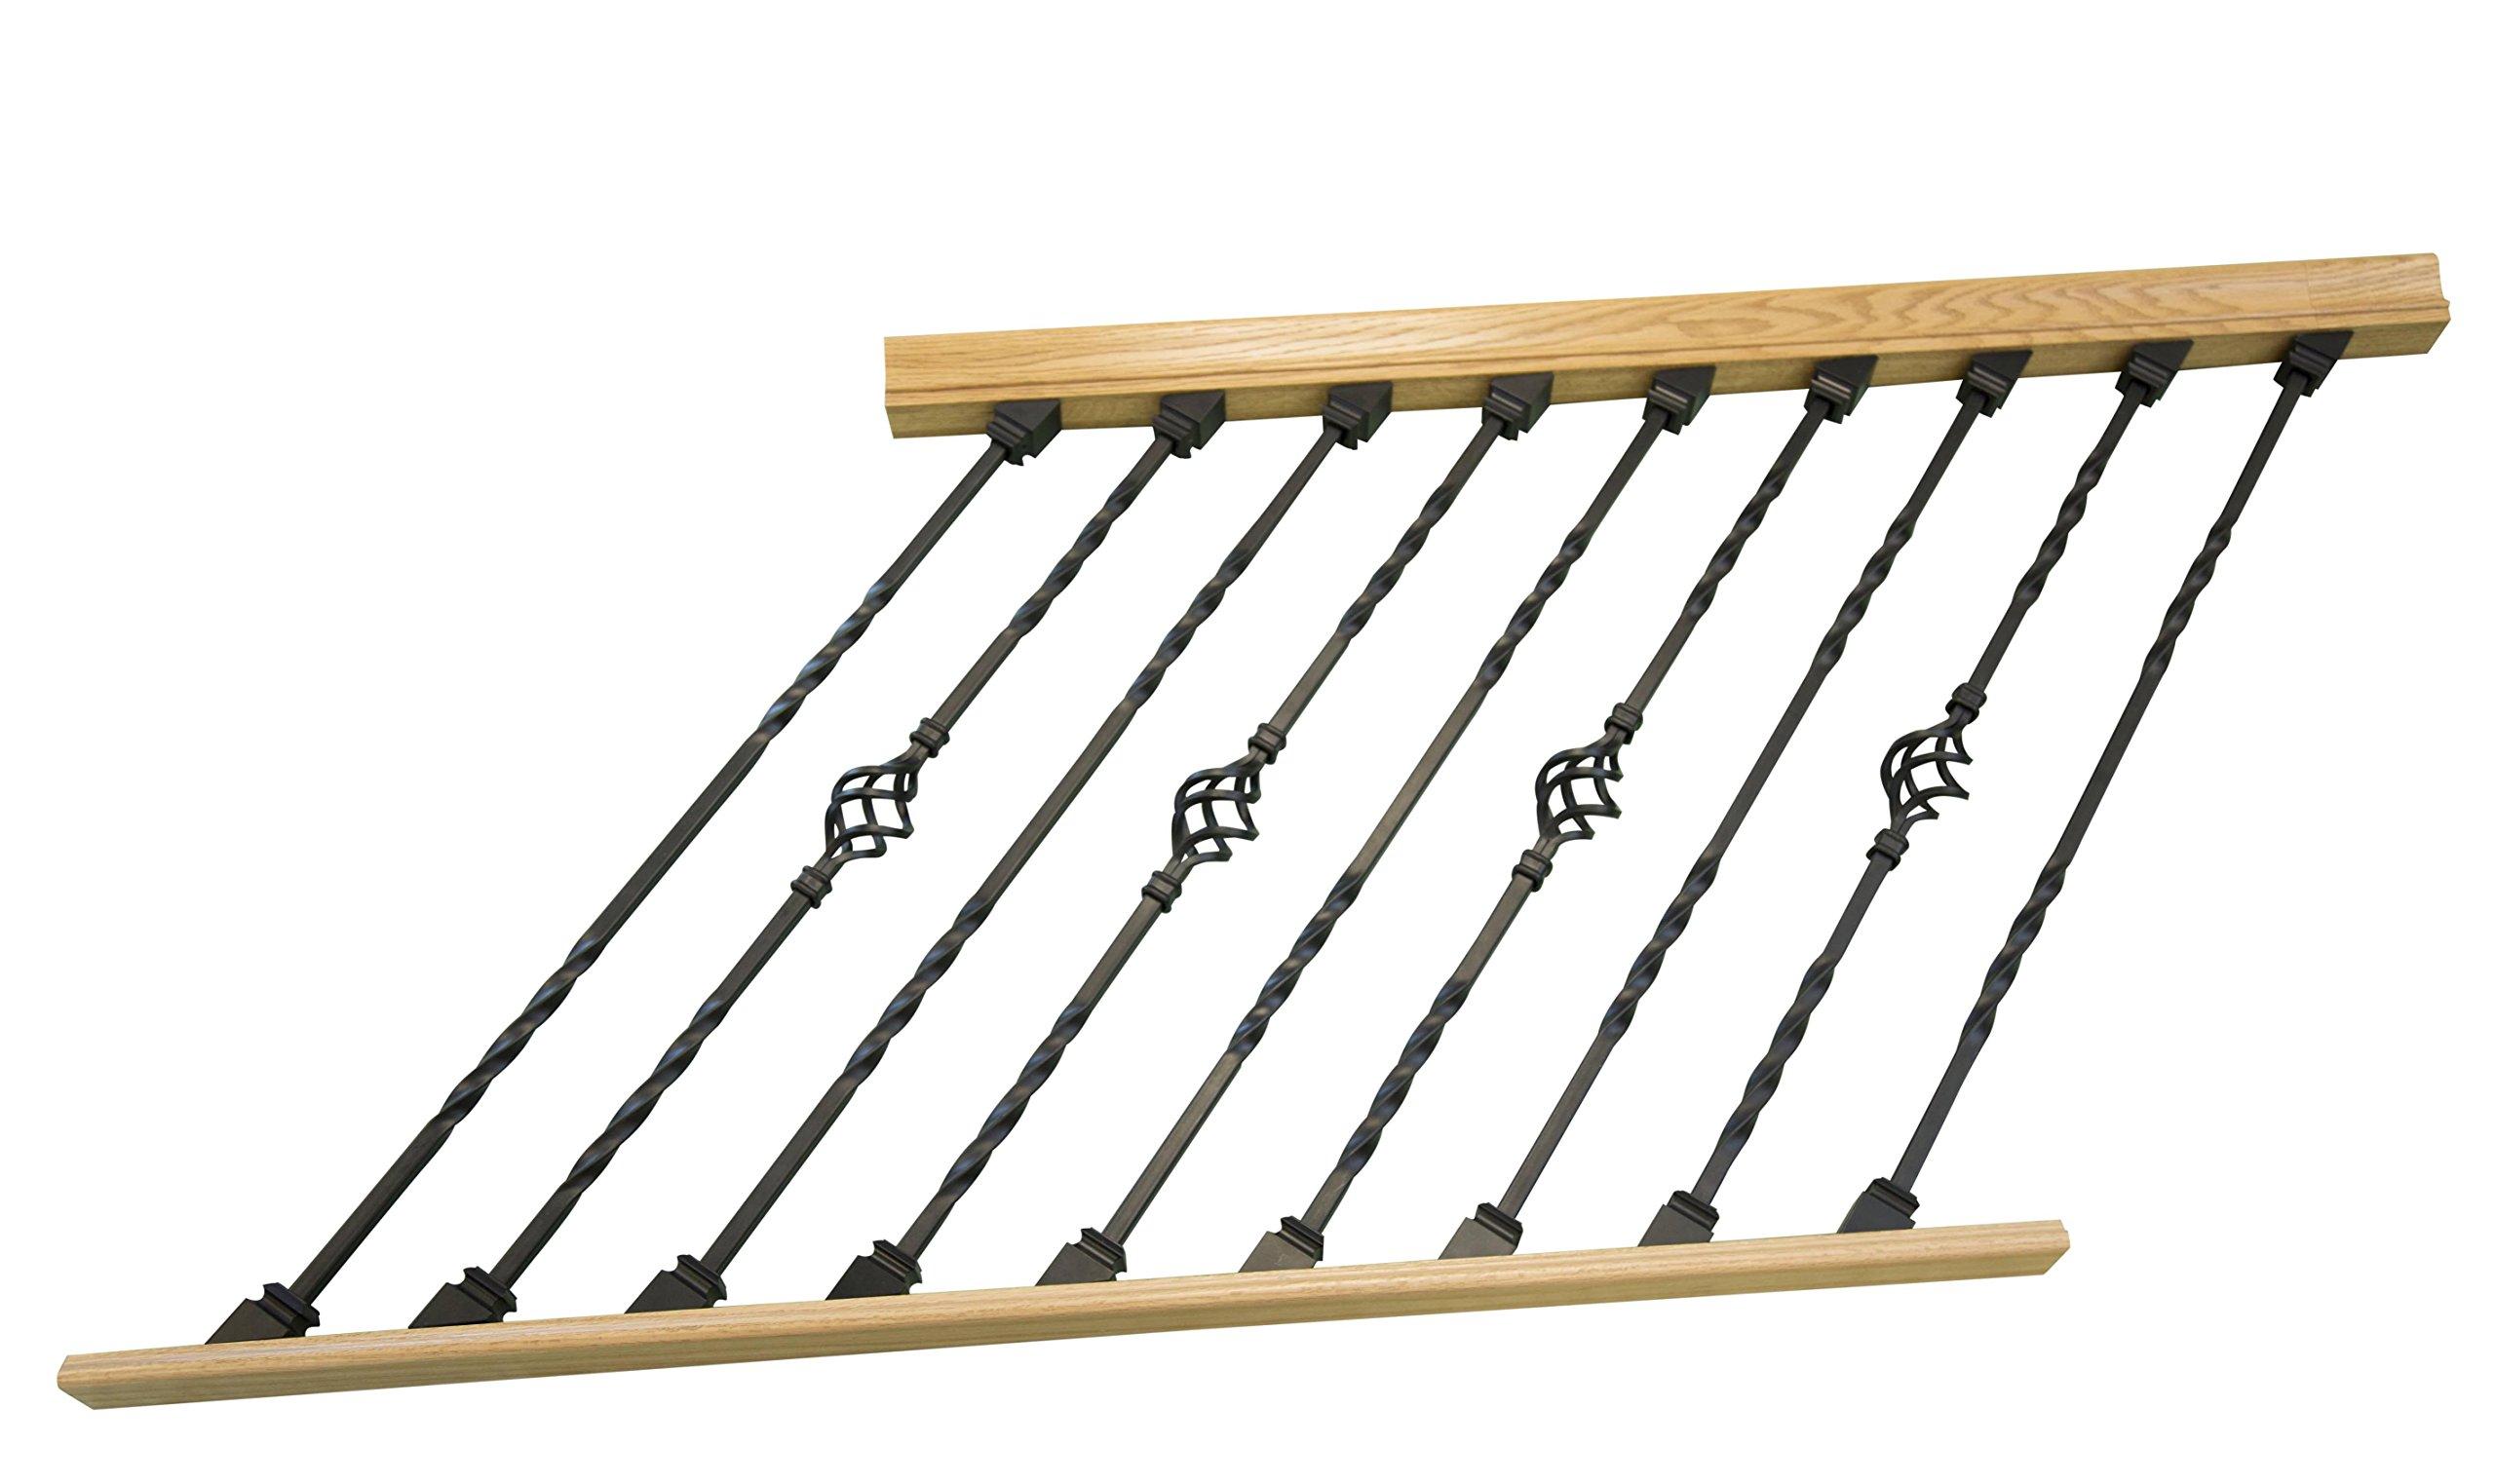 DIY Indoor Adjustable Angle Stair Rail Section with Black Metal Balusters (Double Twist, Single Basket) (Rake 6ft)